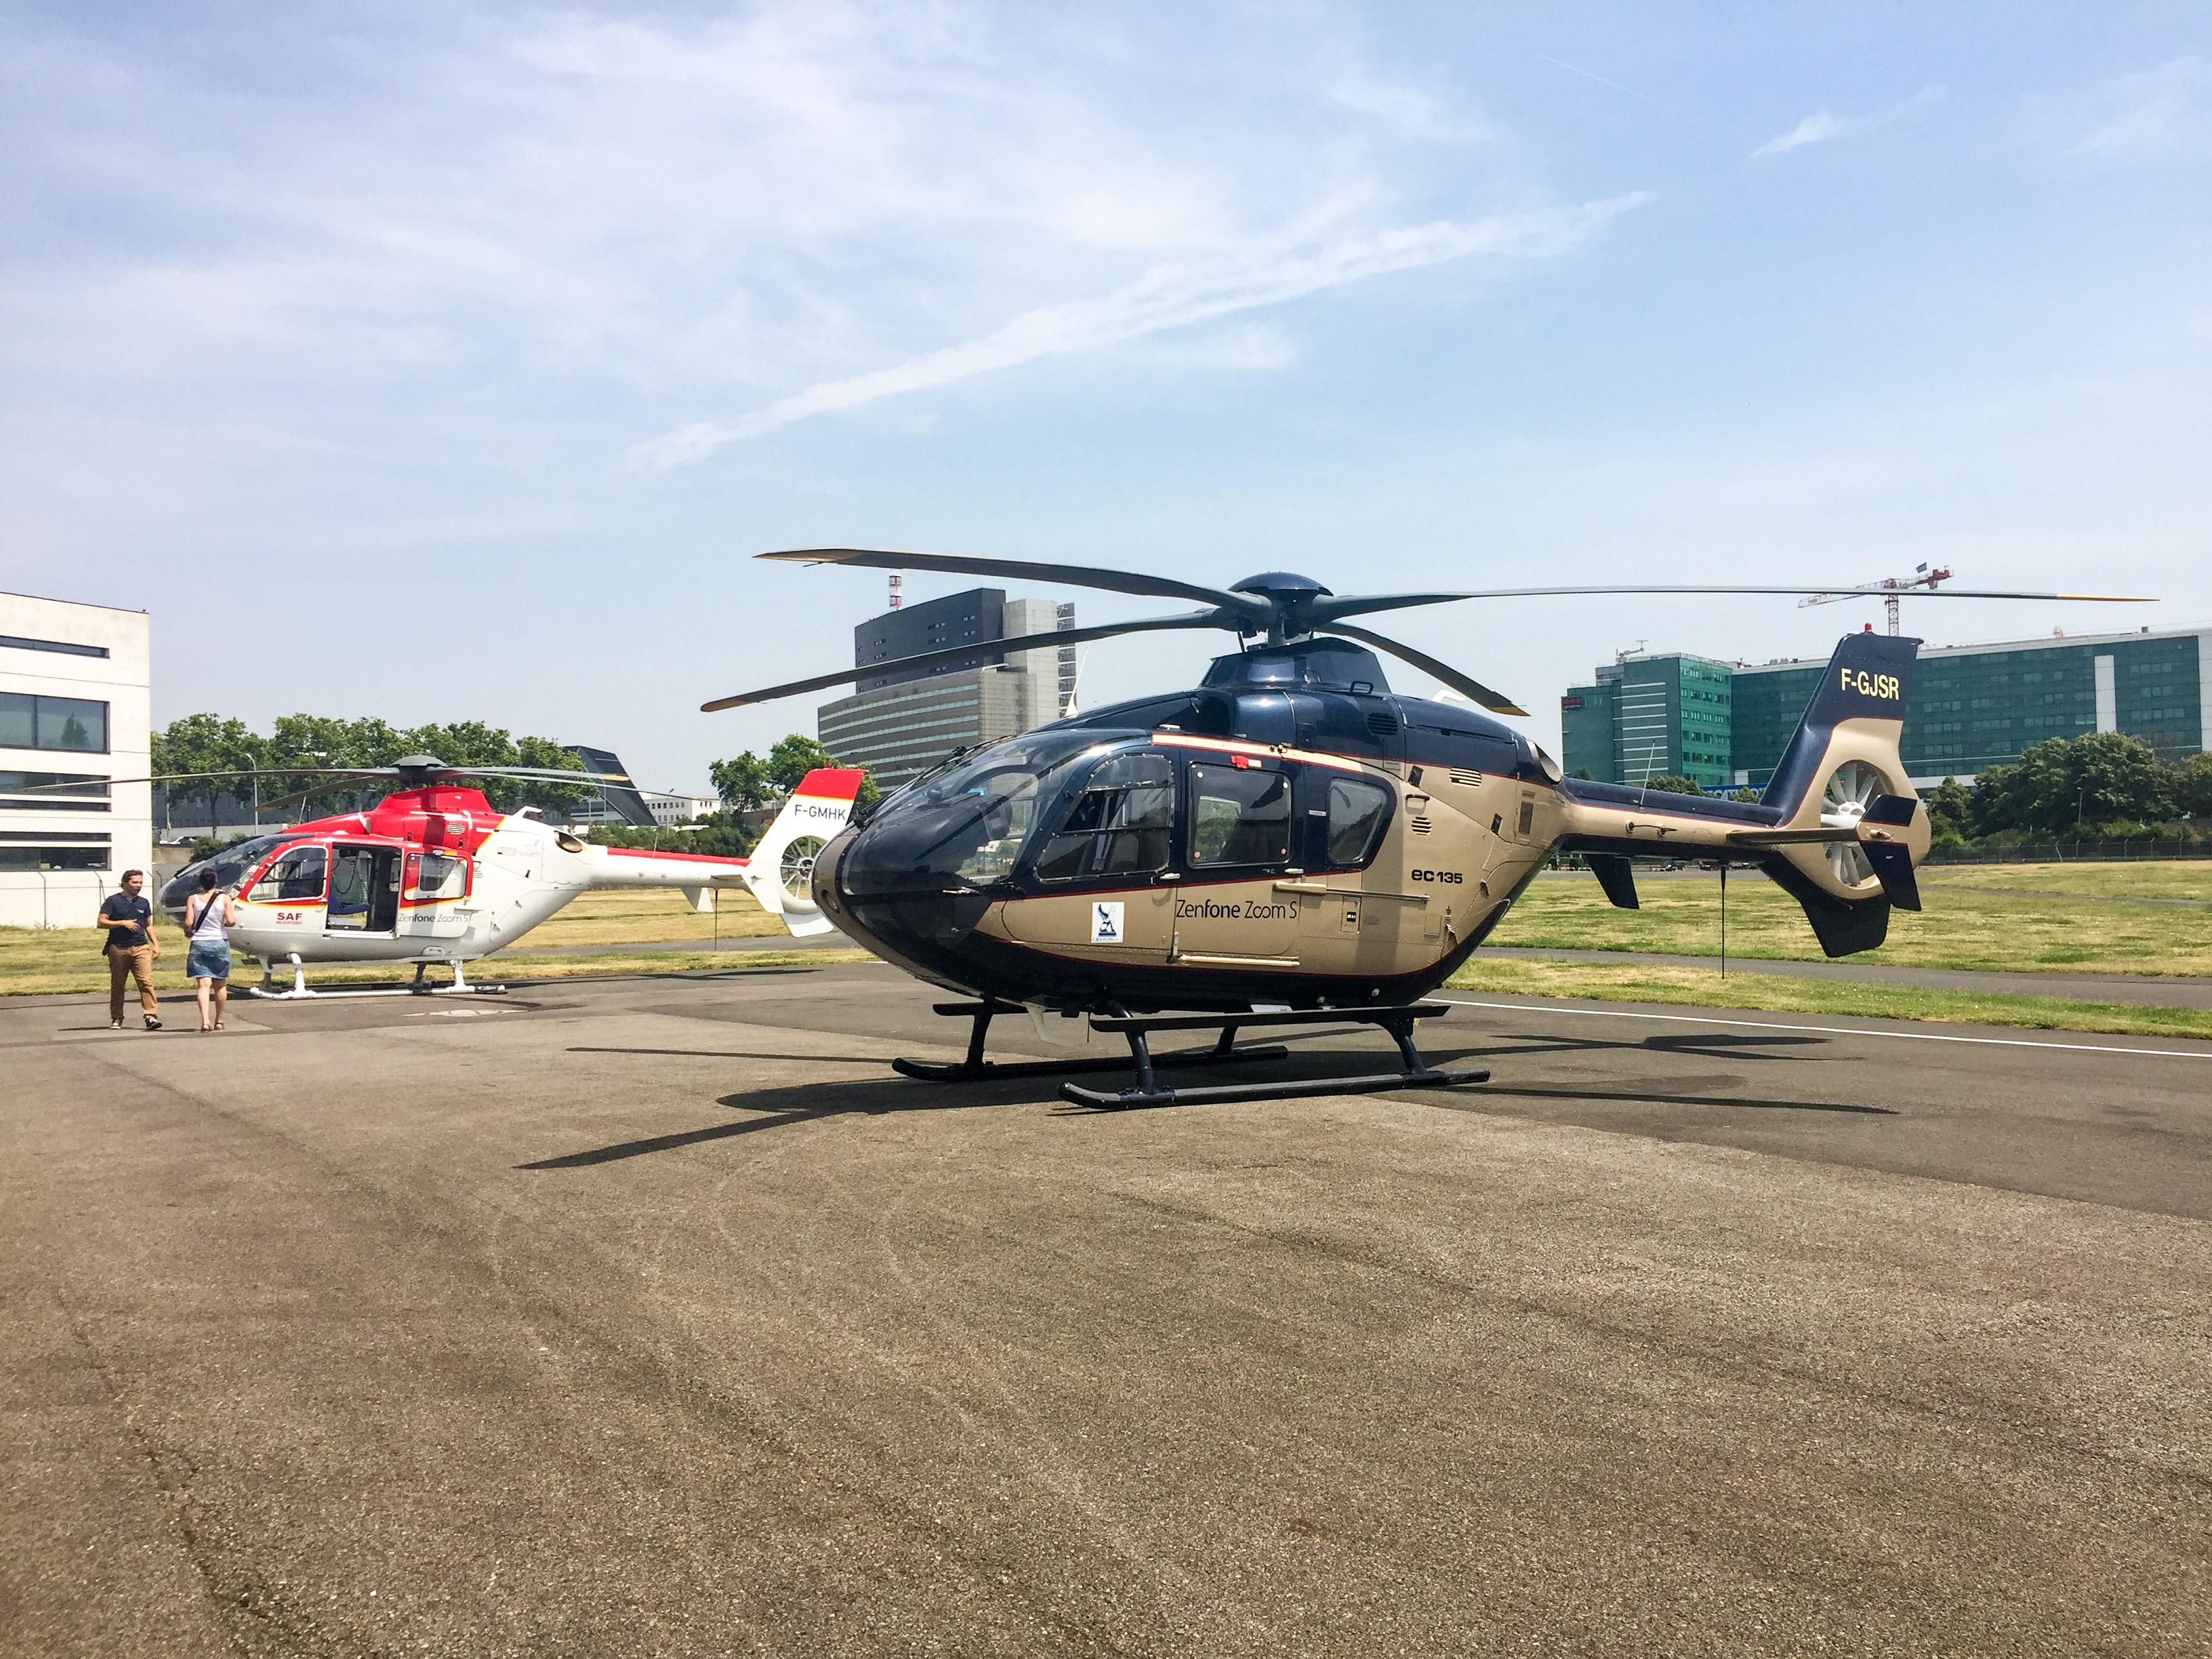 Asus Zenfone Survol Paris Helicoptere Helipass